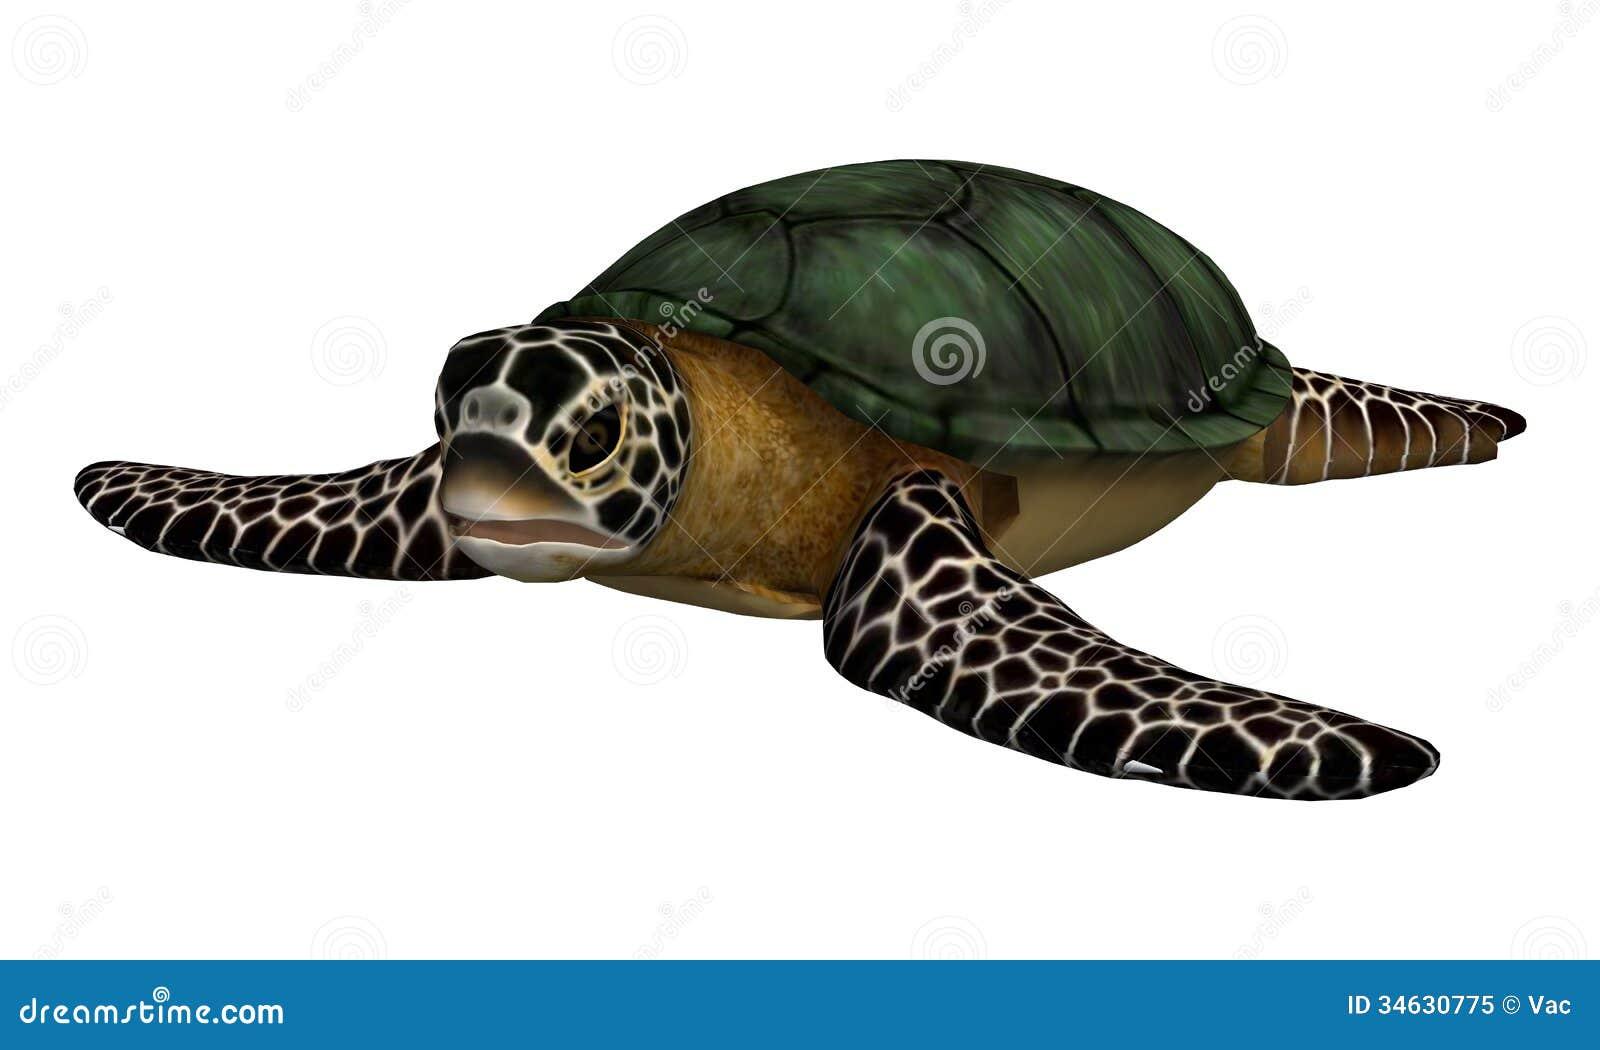 turtle white background - photo #14